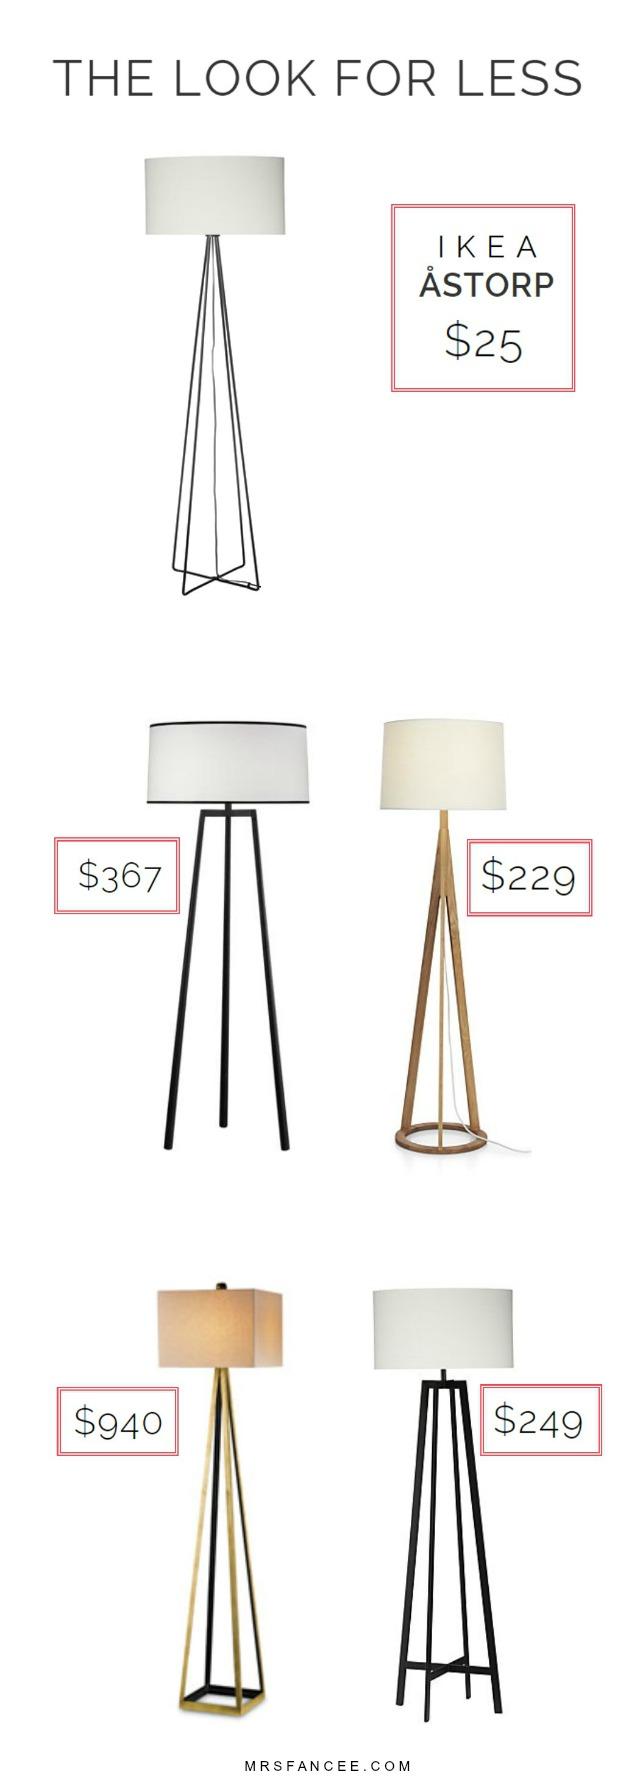 Ikea astorp floor lamp mrs fancee - Ikea schrankwand weiay ...